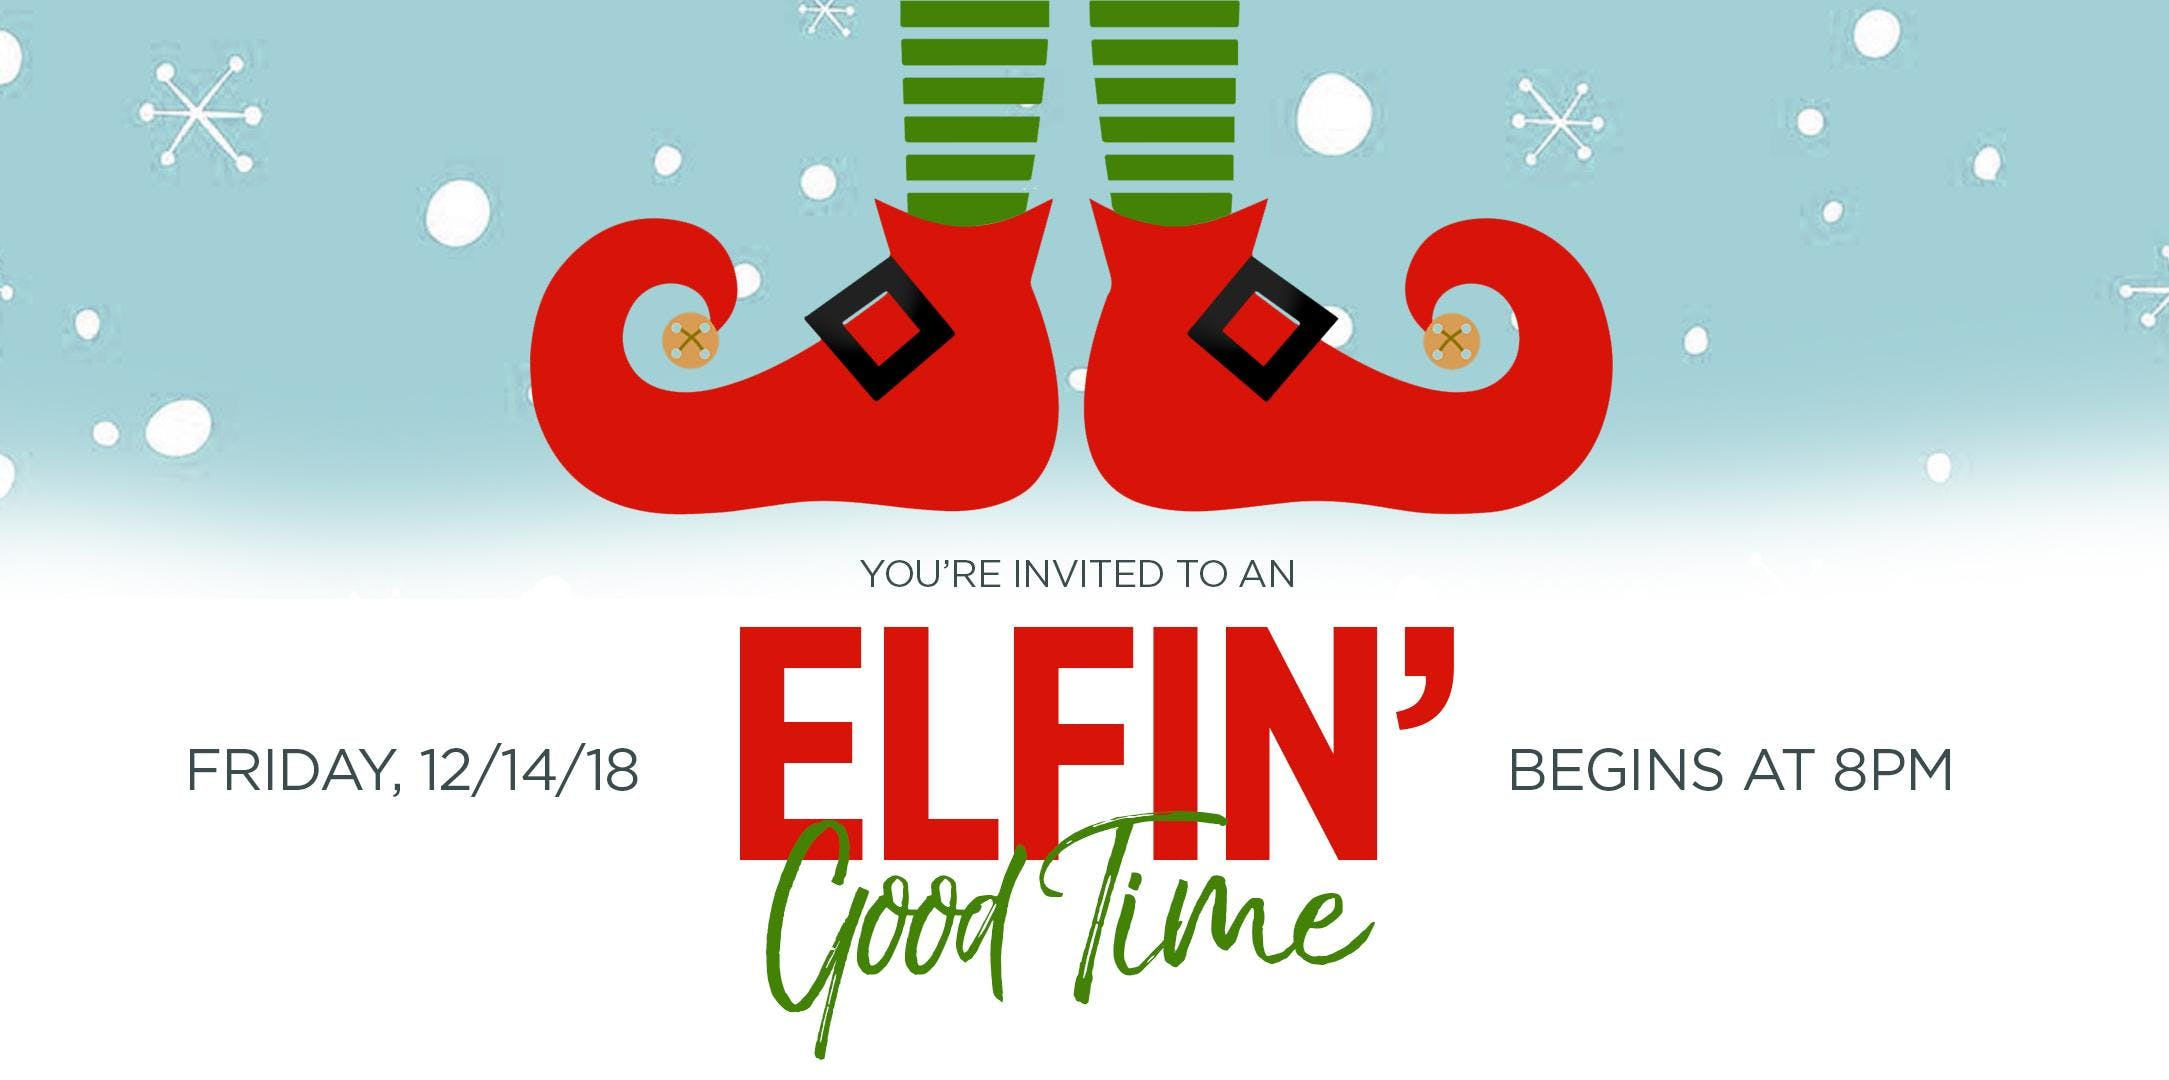 An Elfin' Good Time